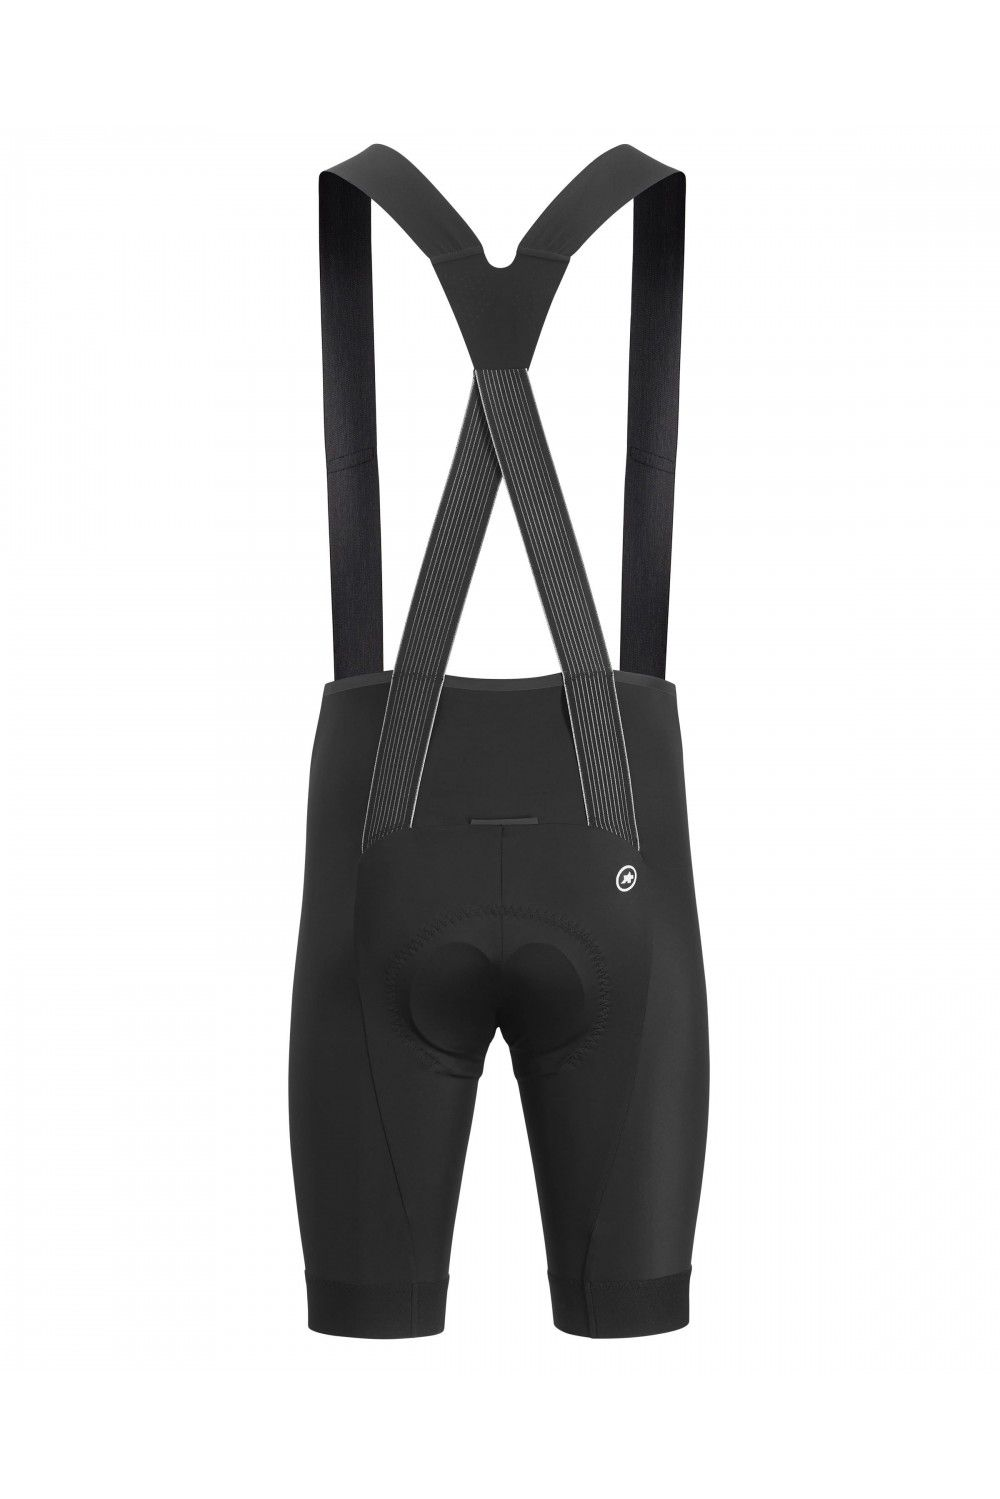 Cuissard Assos Equipe RS Bib Short S9 BlackSeries (Noir)